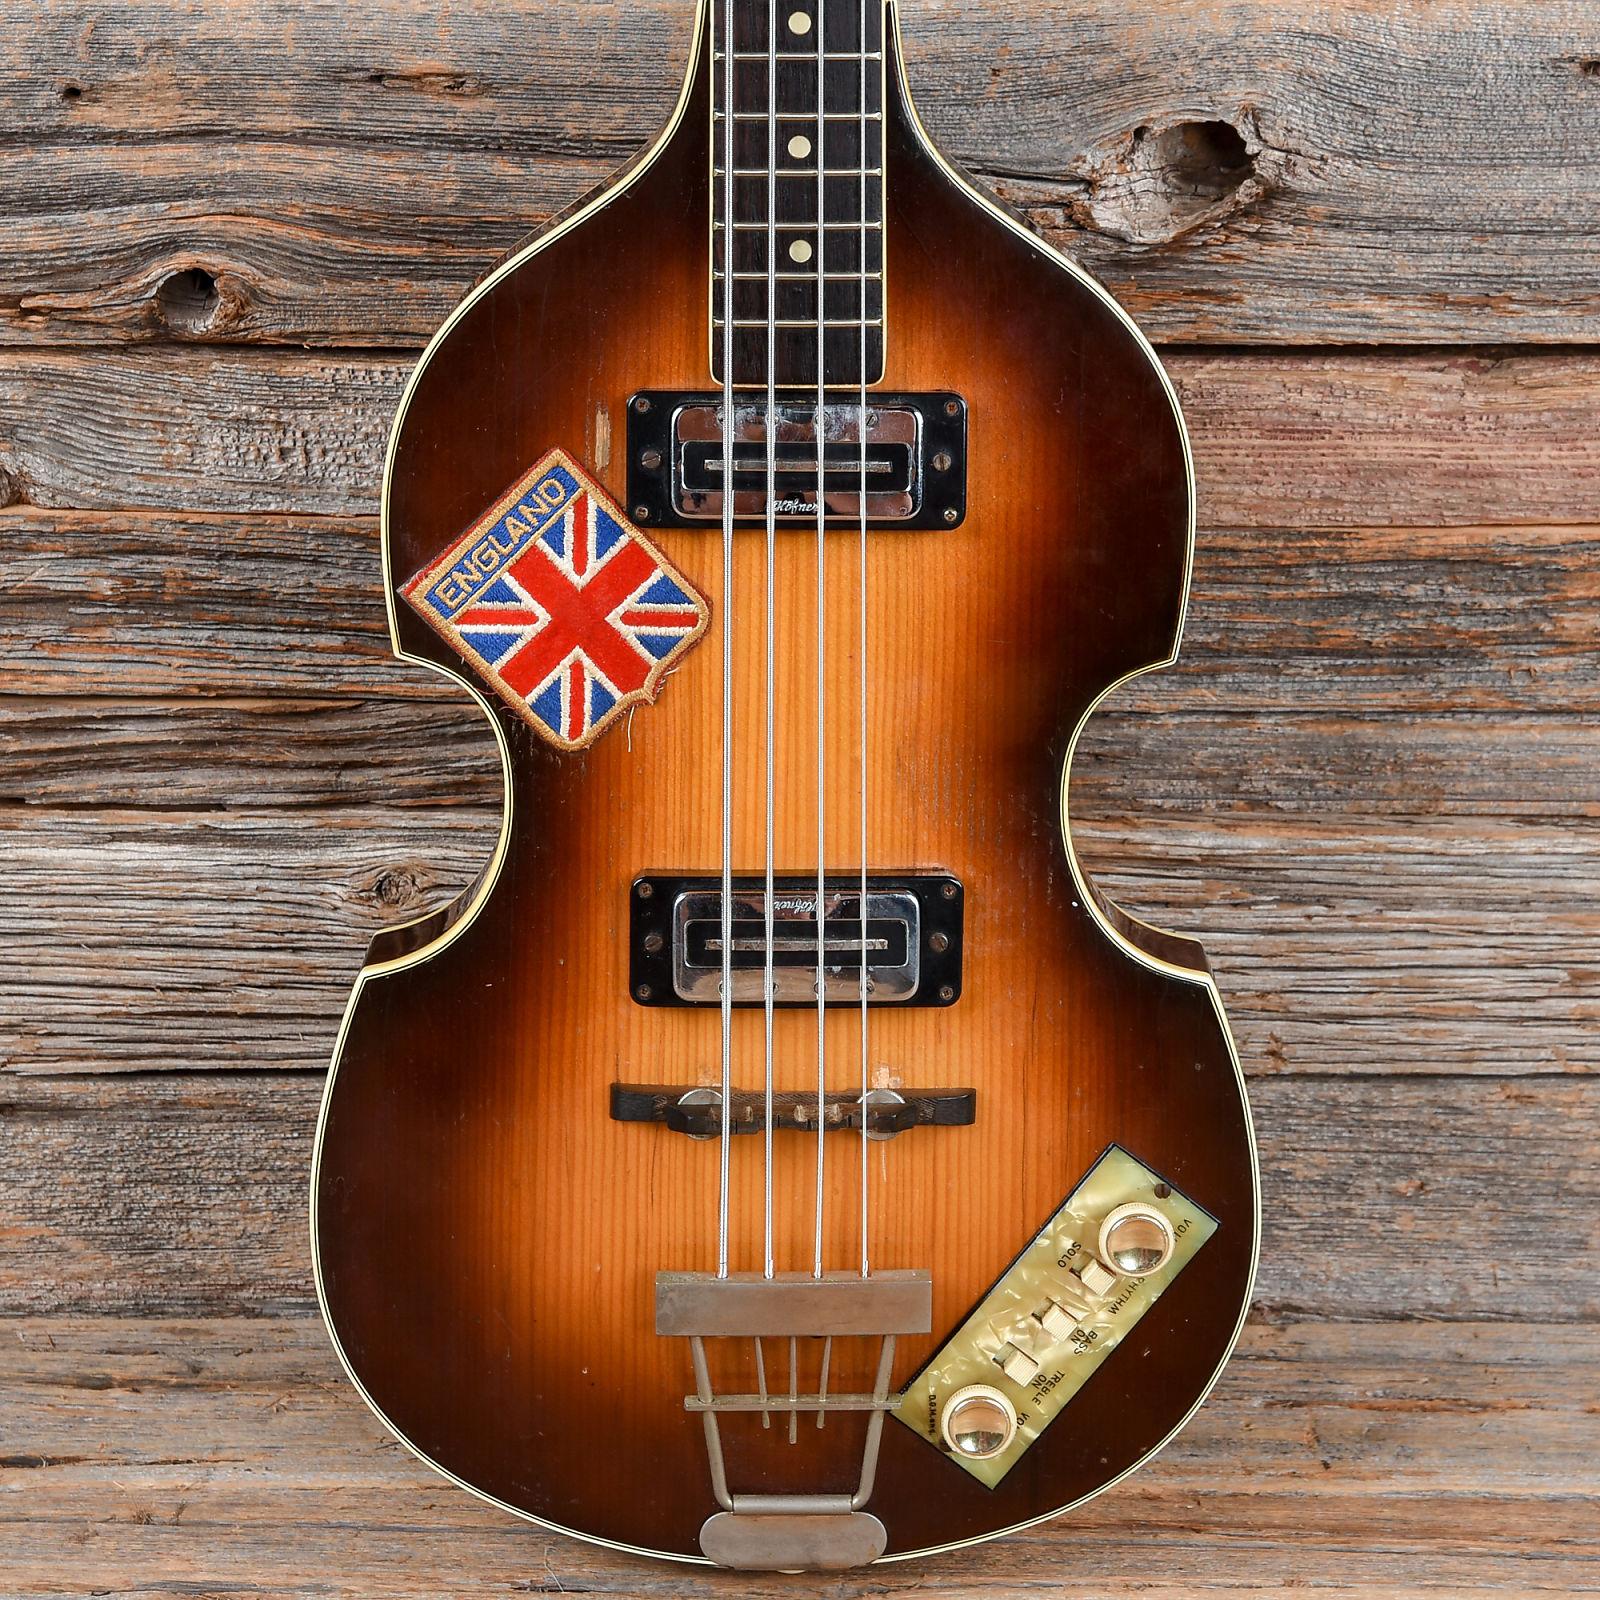 Hofner 500 1 Violin Bass Sunburst 1960s Used Wiring Diagram